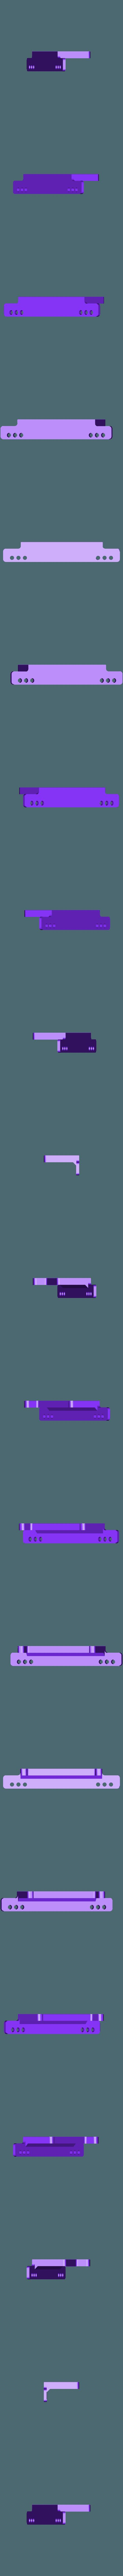 HDD bracket right.STL Download free STL file Raspberry Pi 3 B+ enclosure • 3D printable model, kgitman